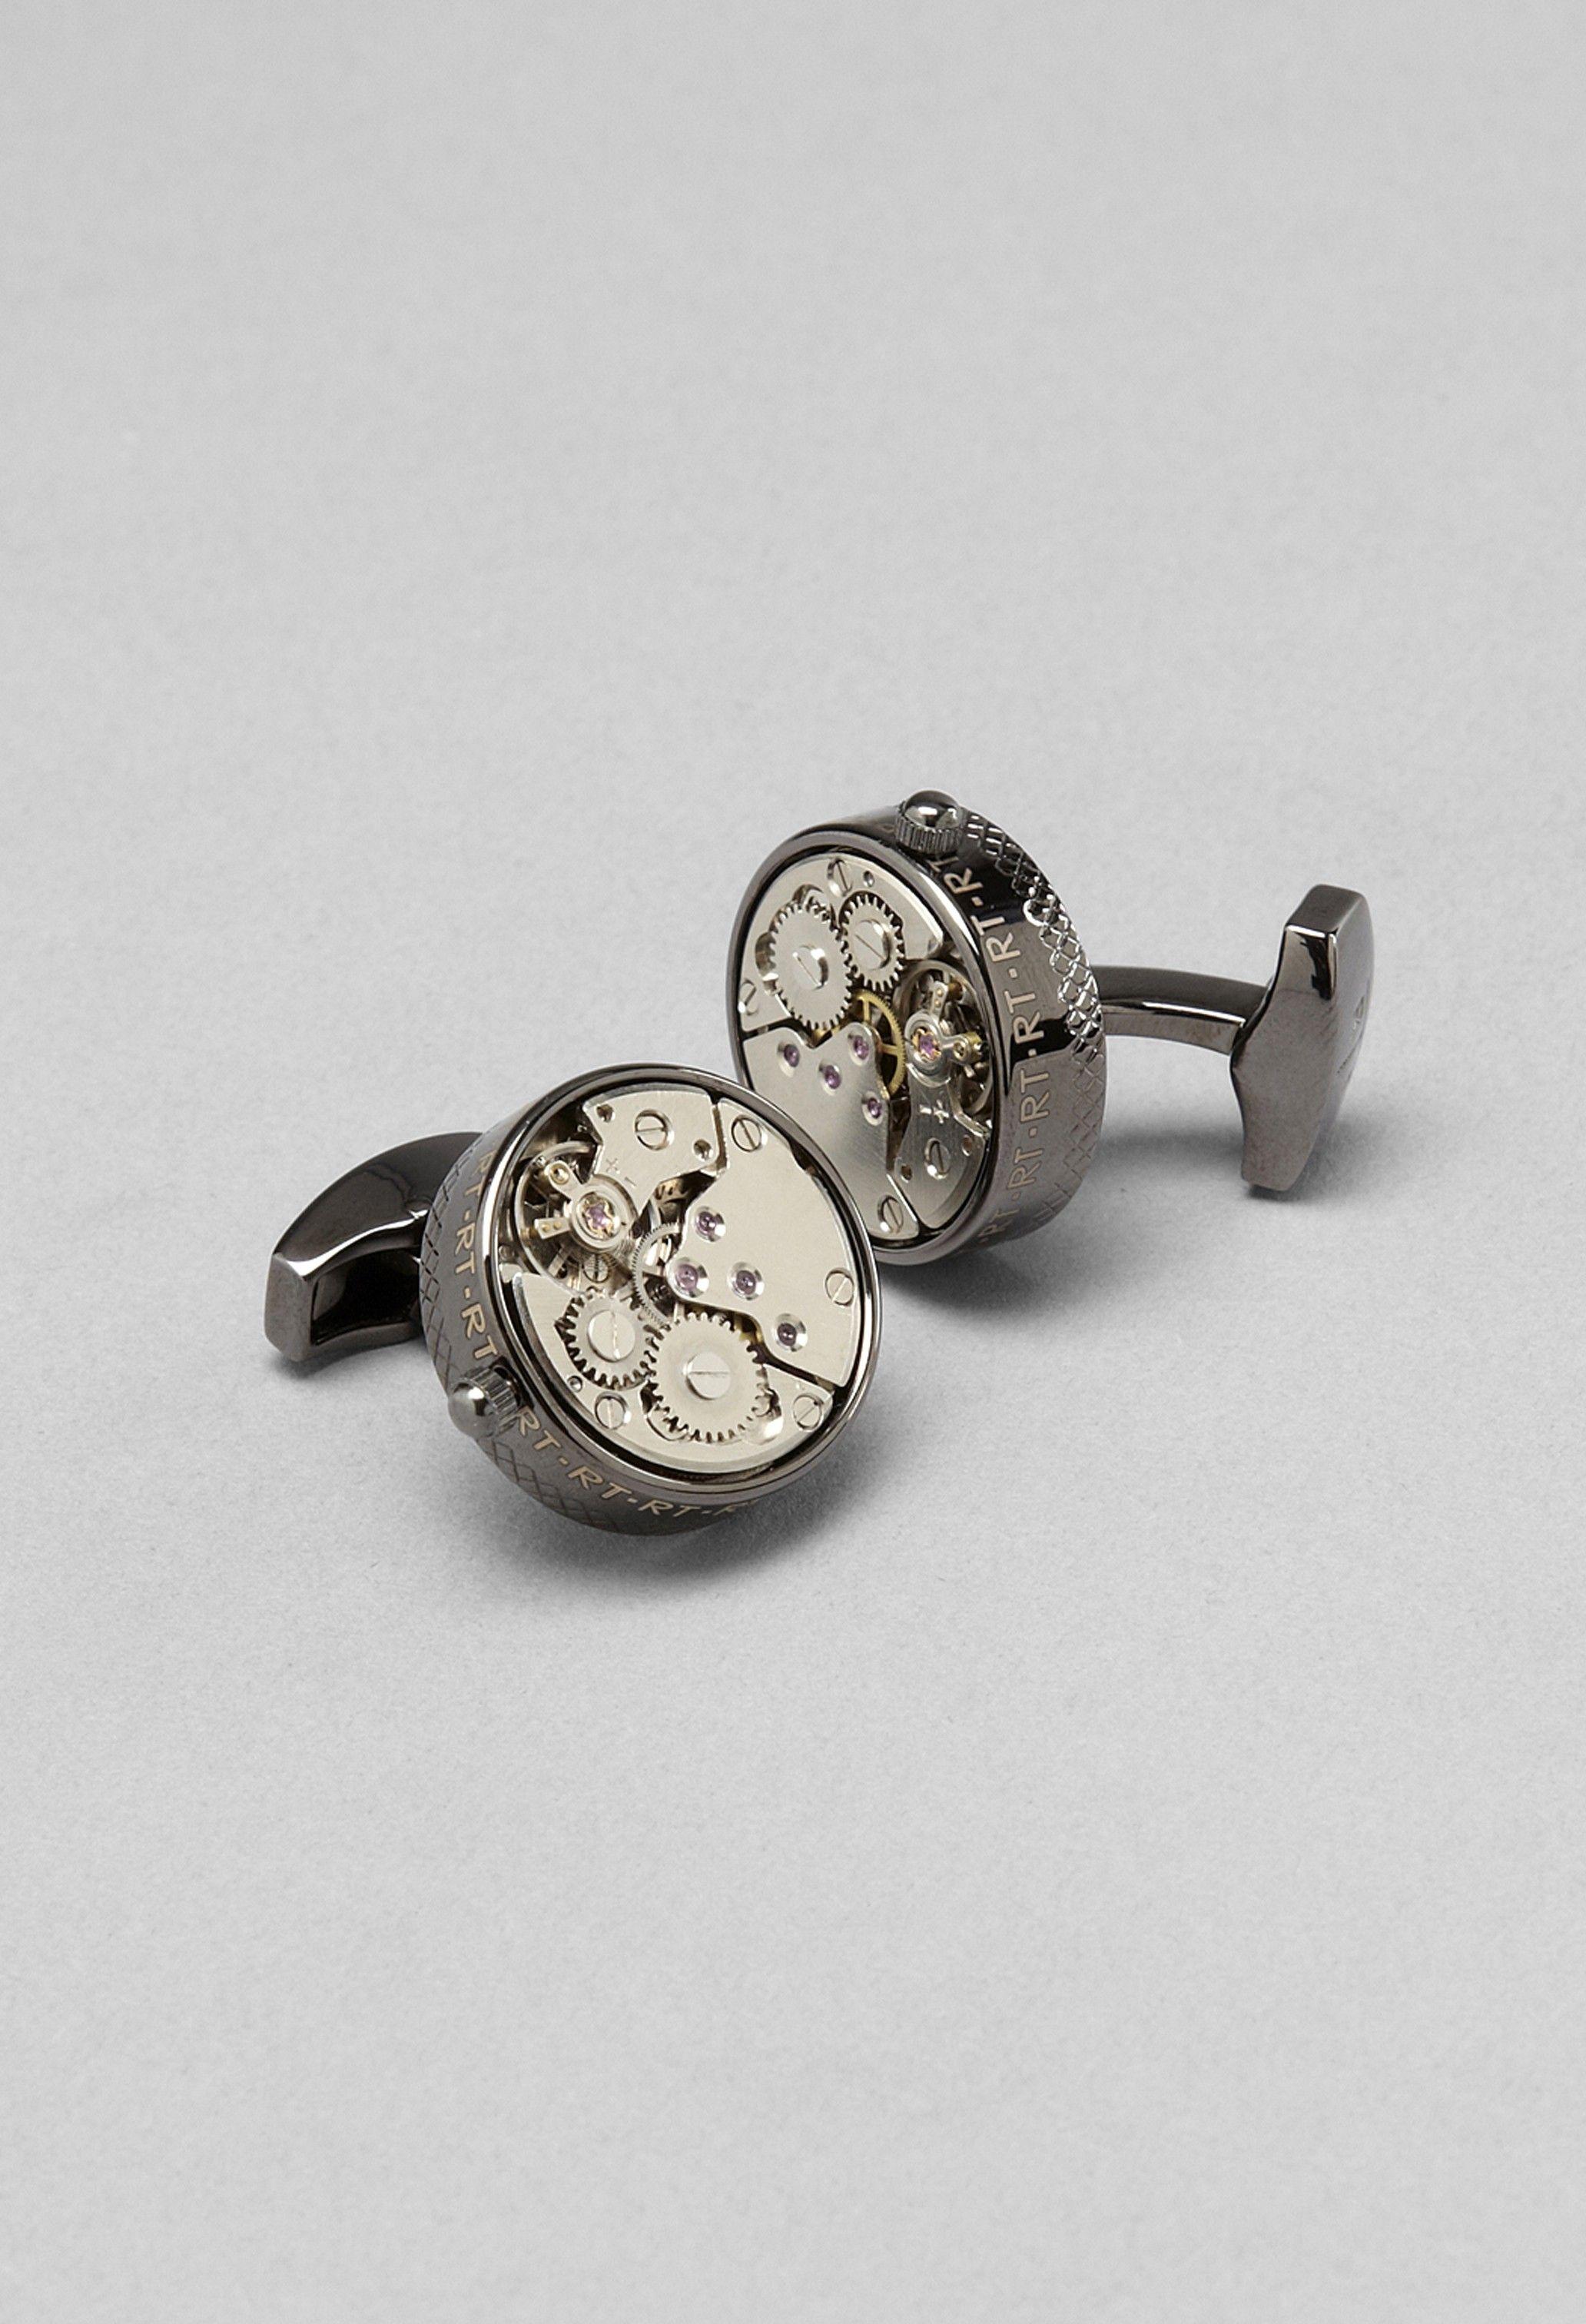 Very cool - Cufflinks with clock engine inside!